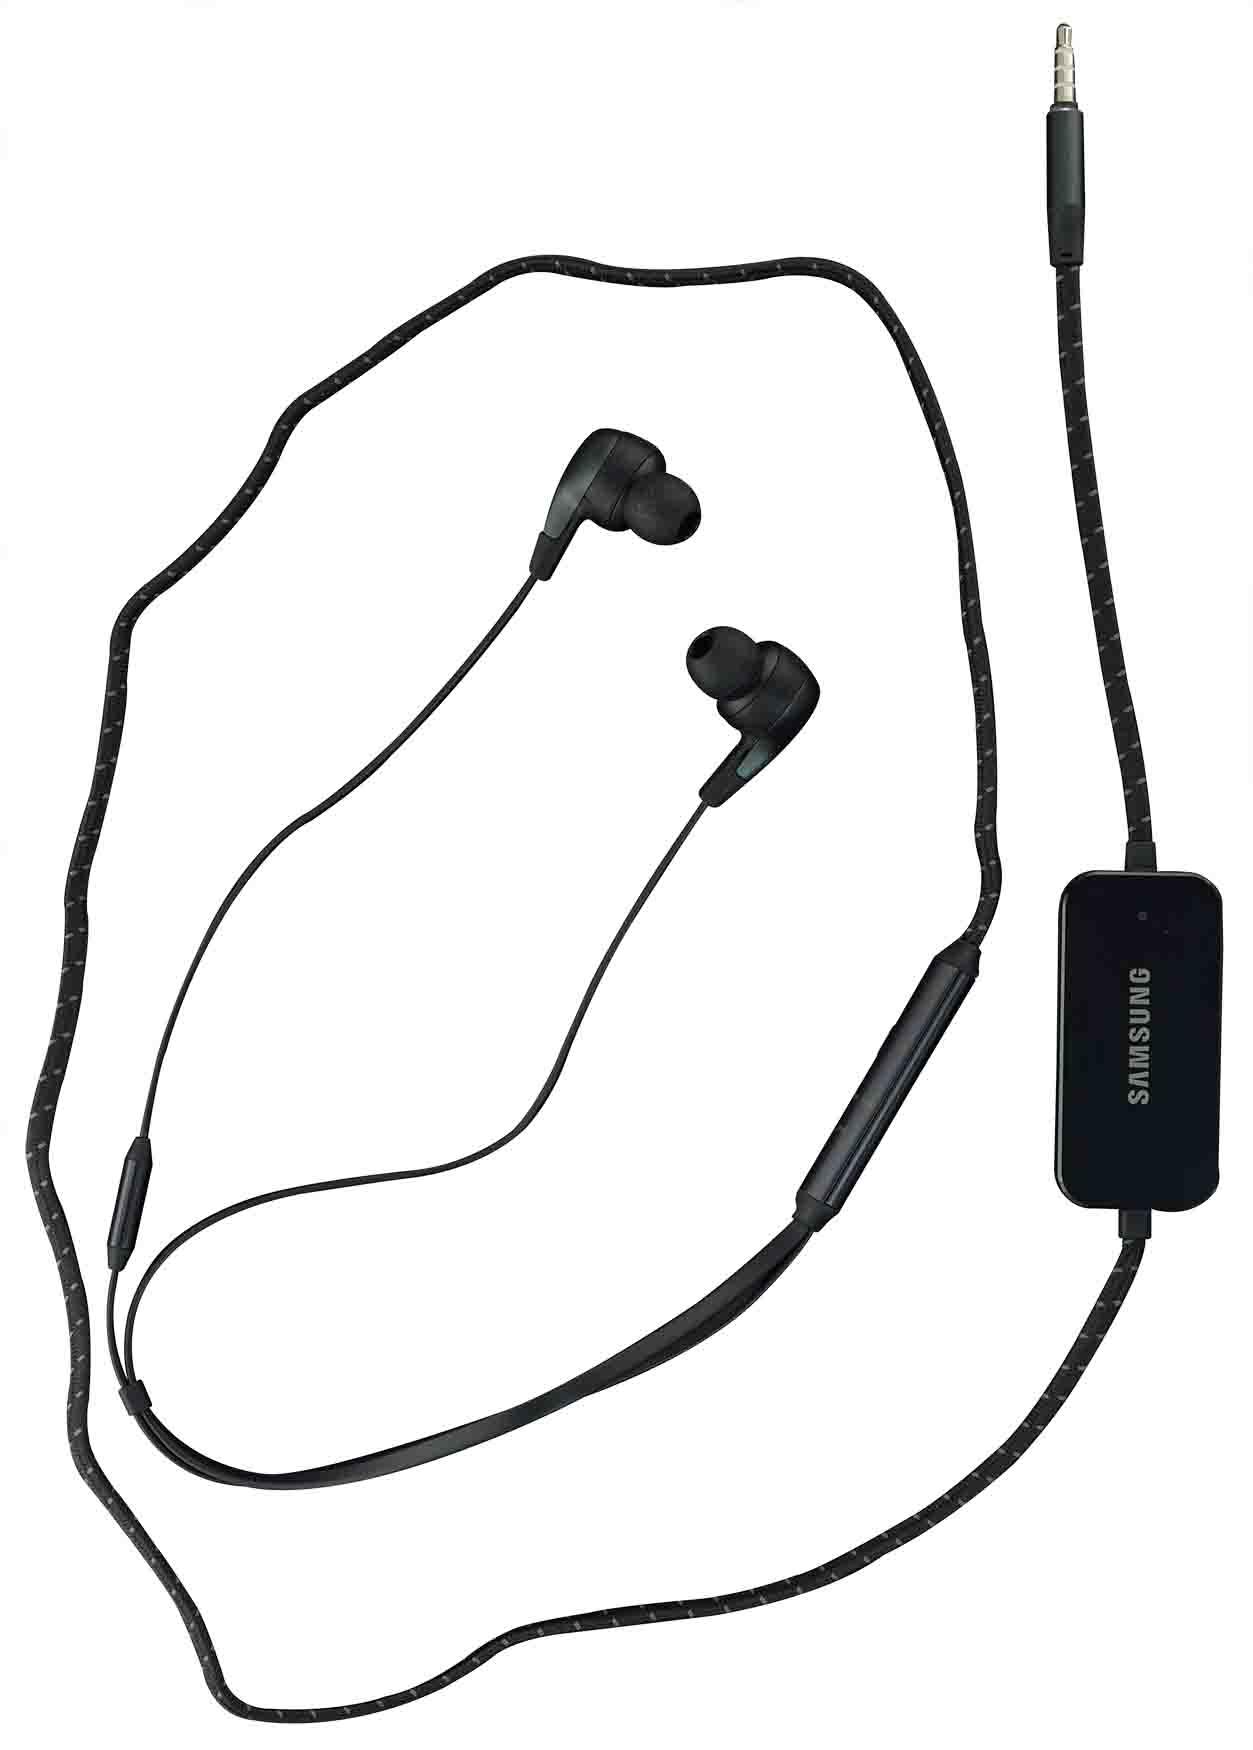 SAMSUNG Advanced ANC Earphones